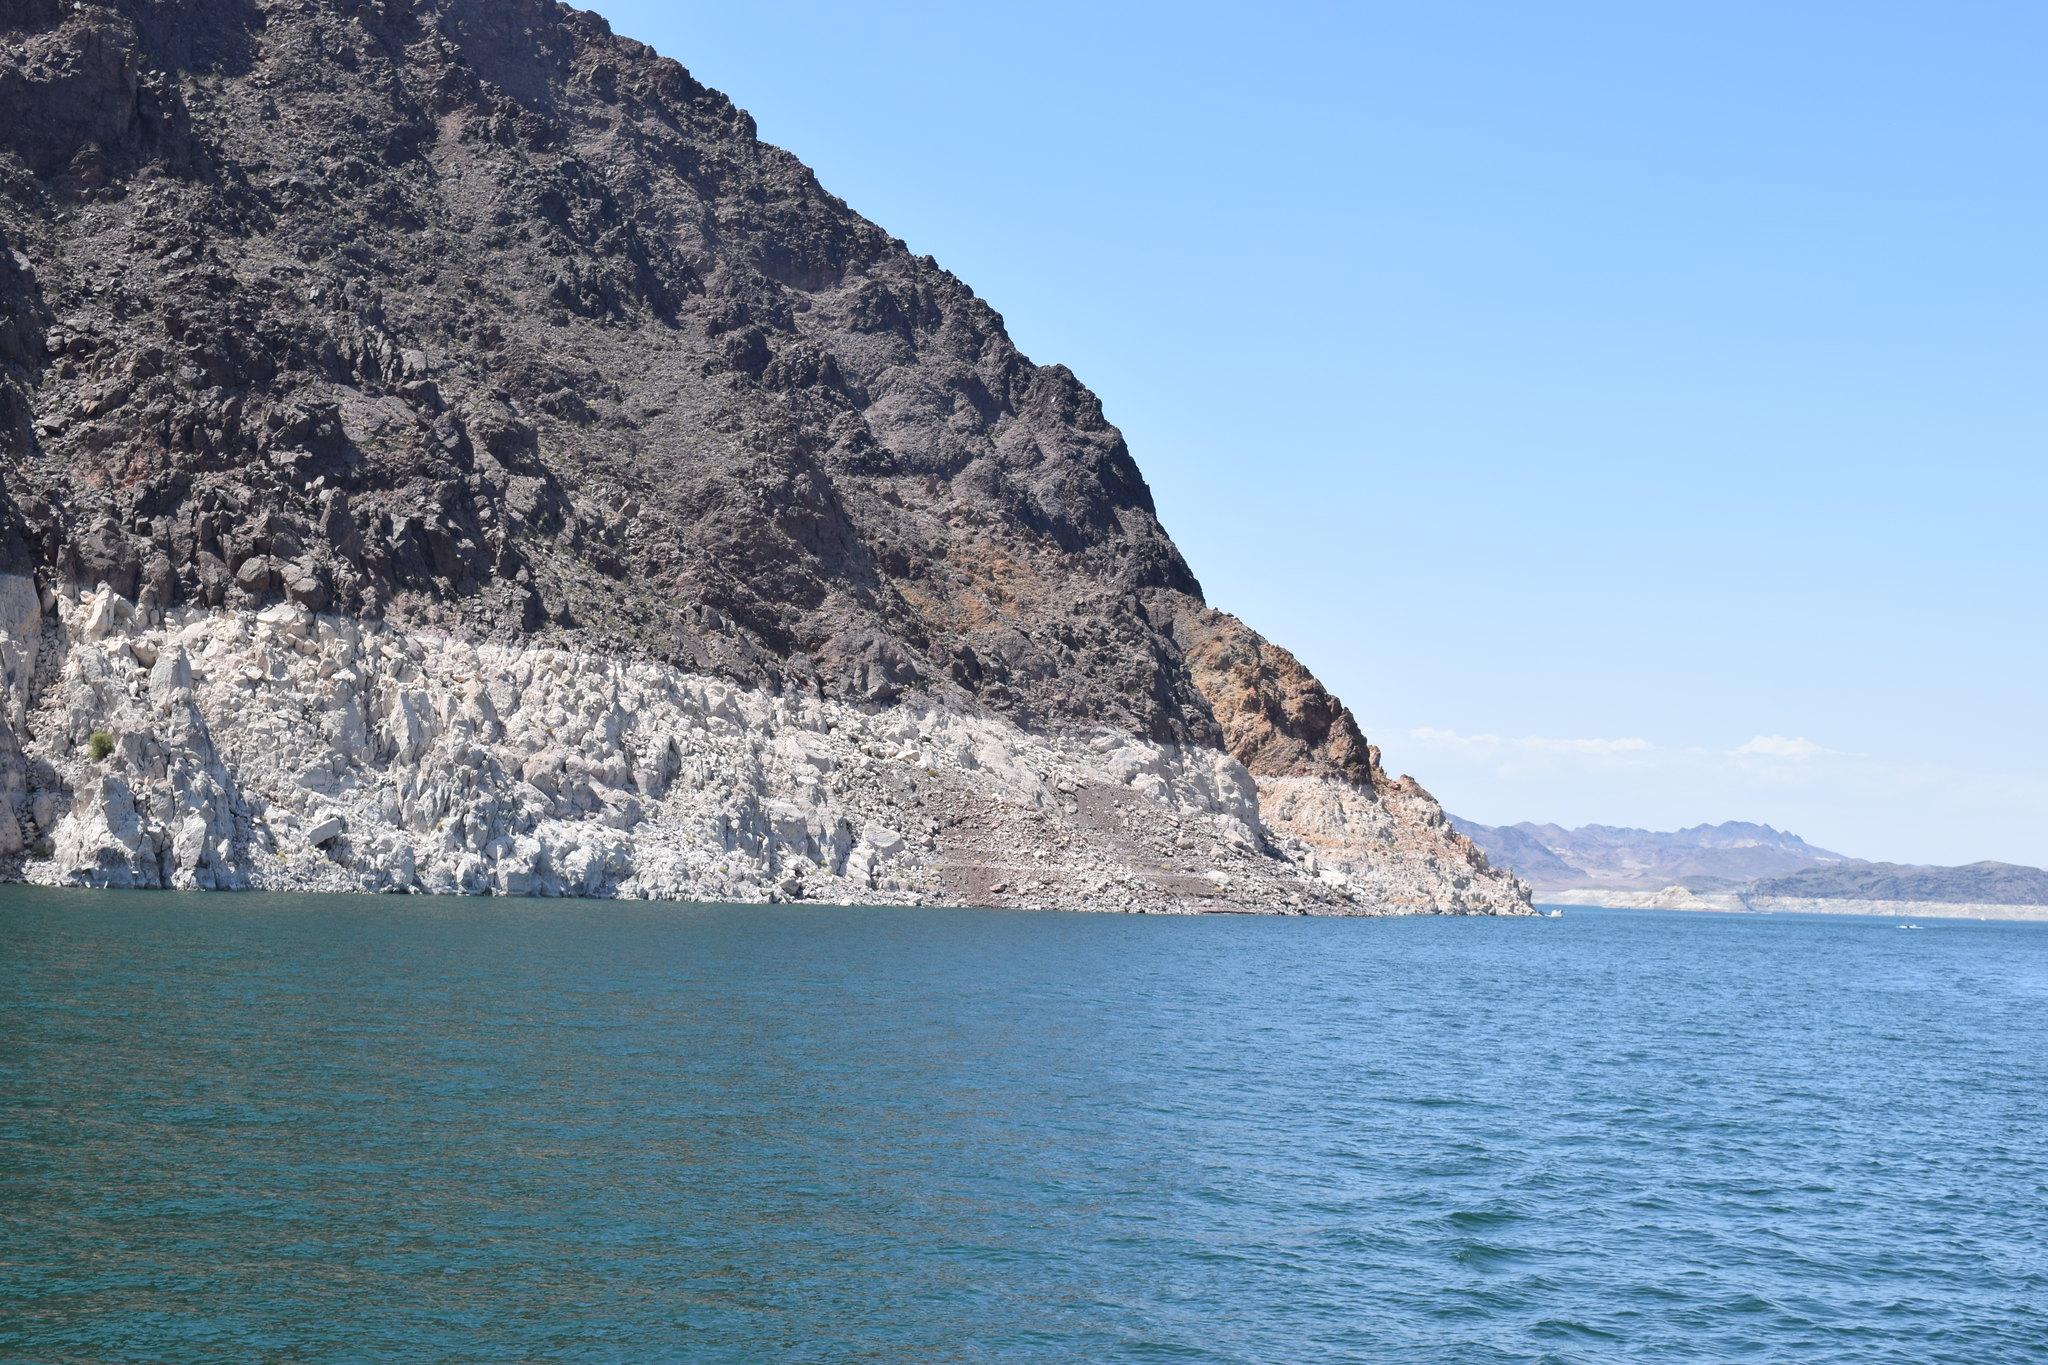 Lake Mead Cruise